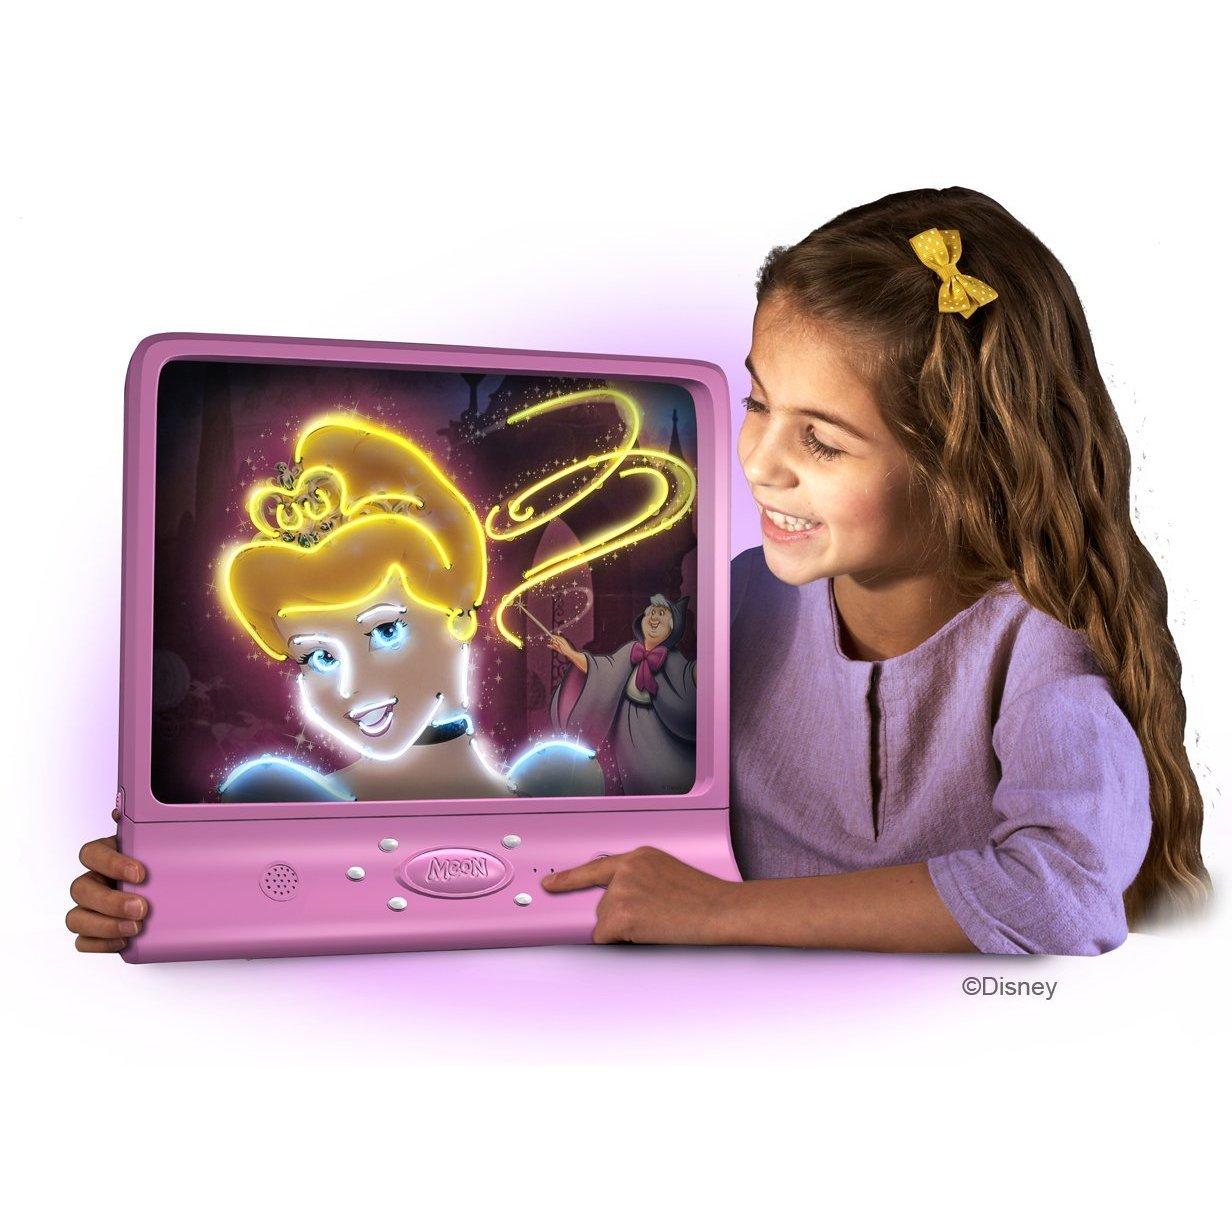 Disney's Princess - Meon Interactive Animation Studio